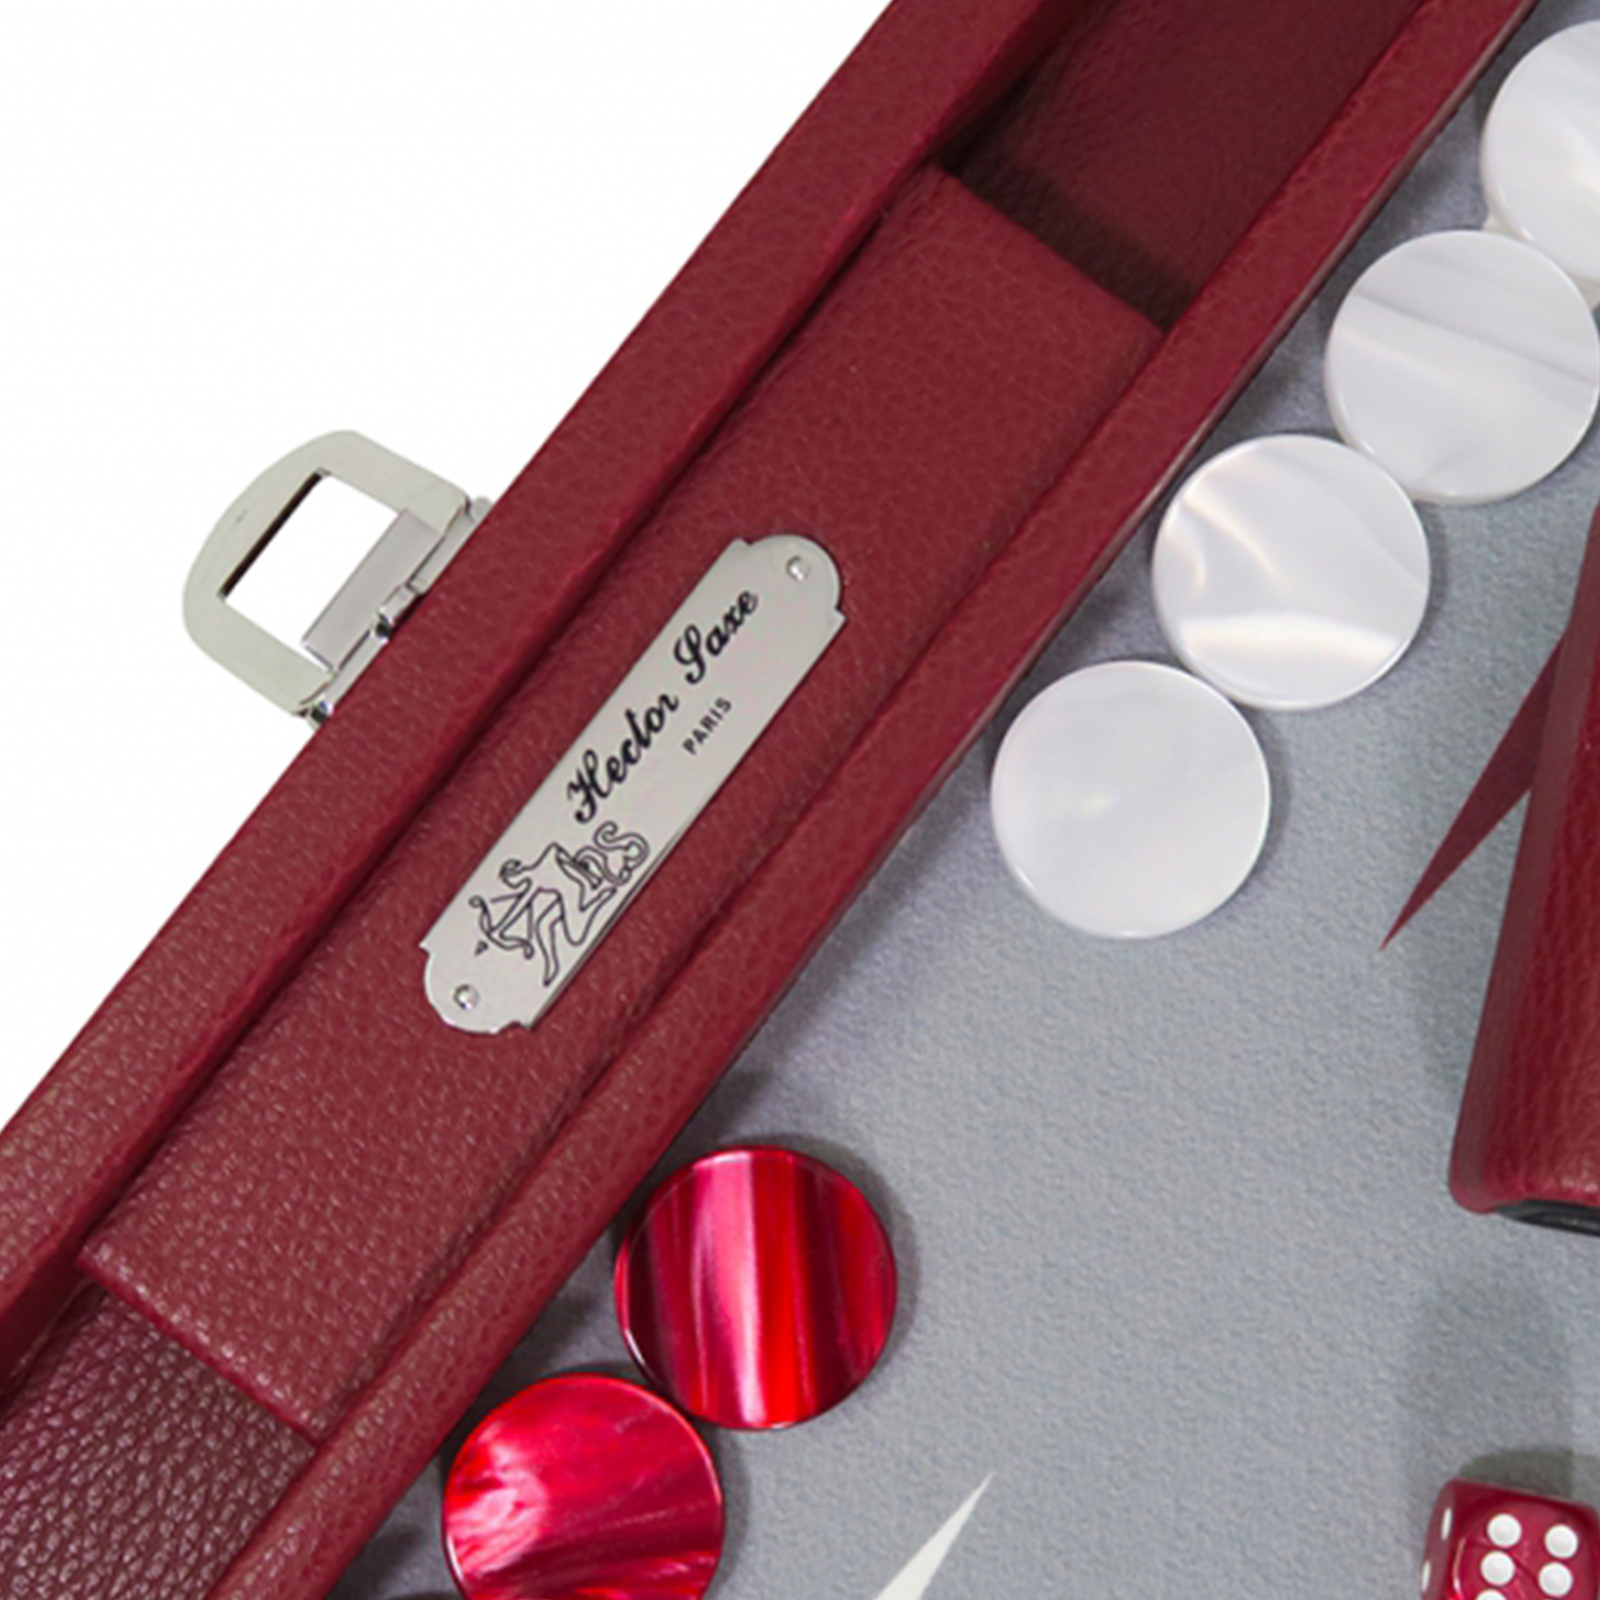 Backgammon - Basile Morgon  Medium          B25 x T37   (geöffnet B50 x T37) Hector Saxe